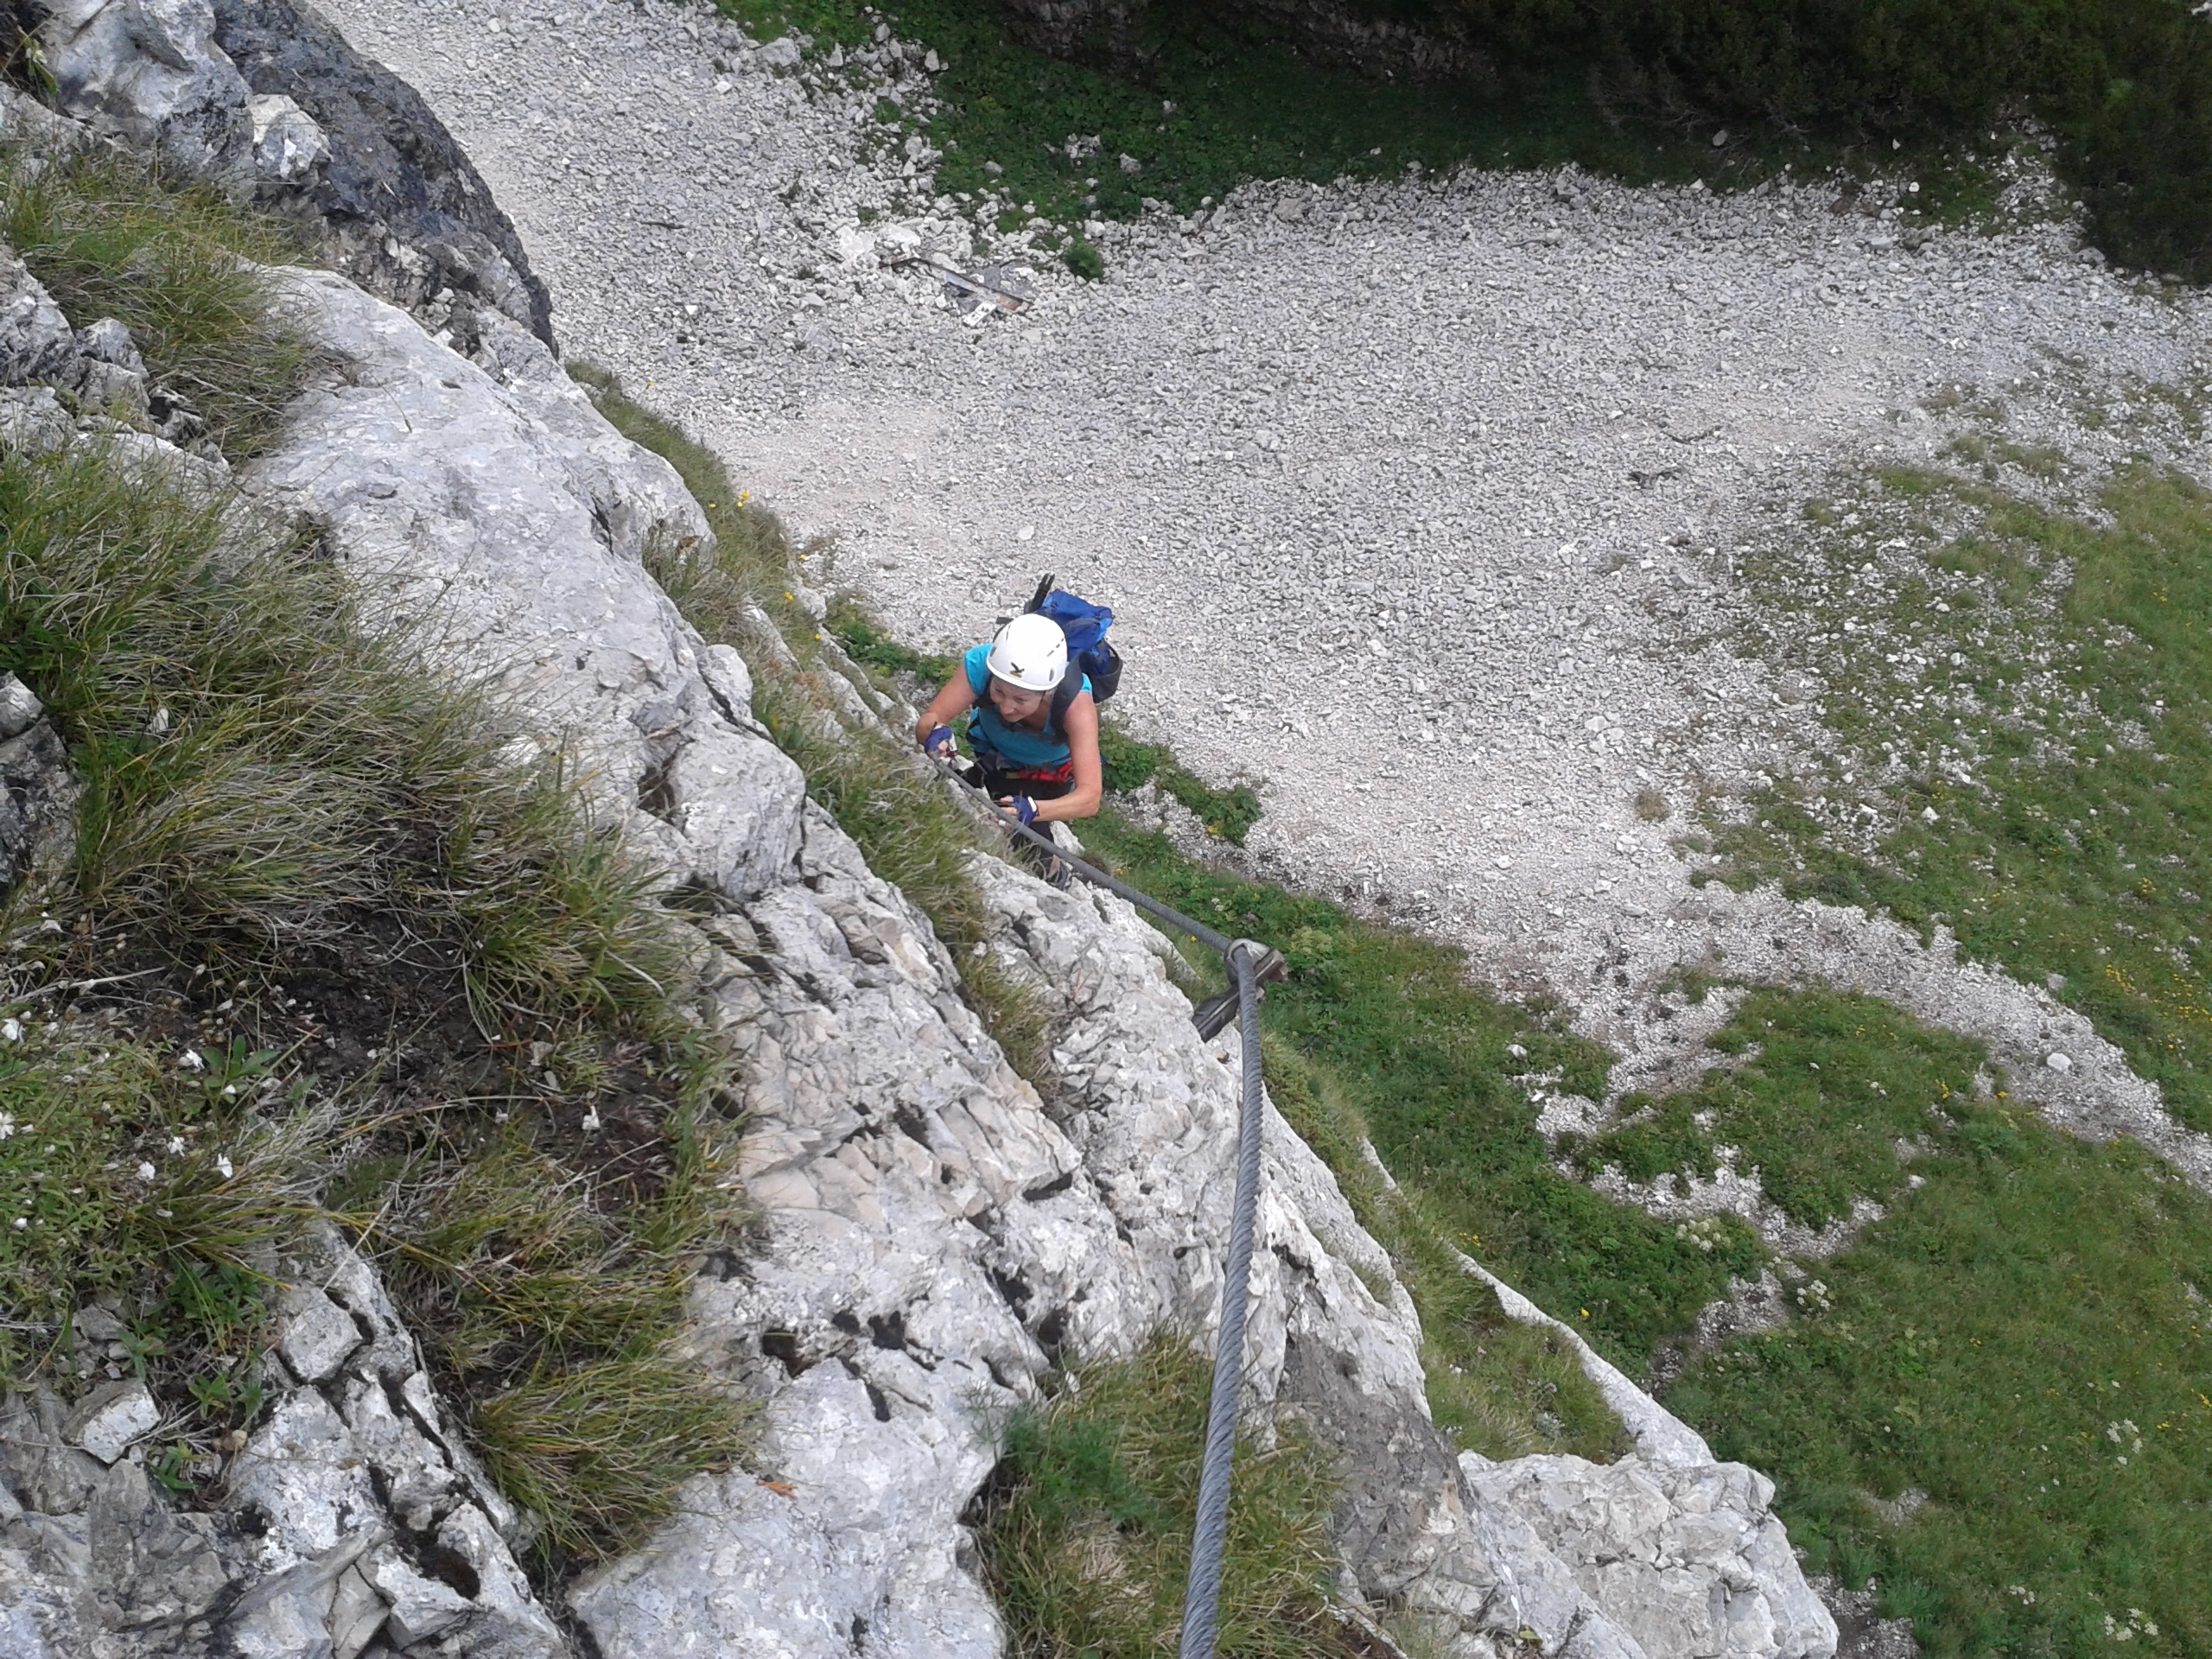 Klettersteig Loser : Loser panorama klettersteig sisi climbing plus